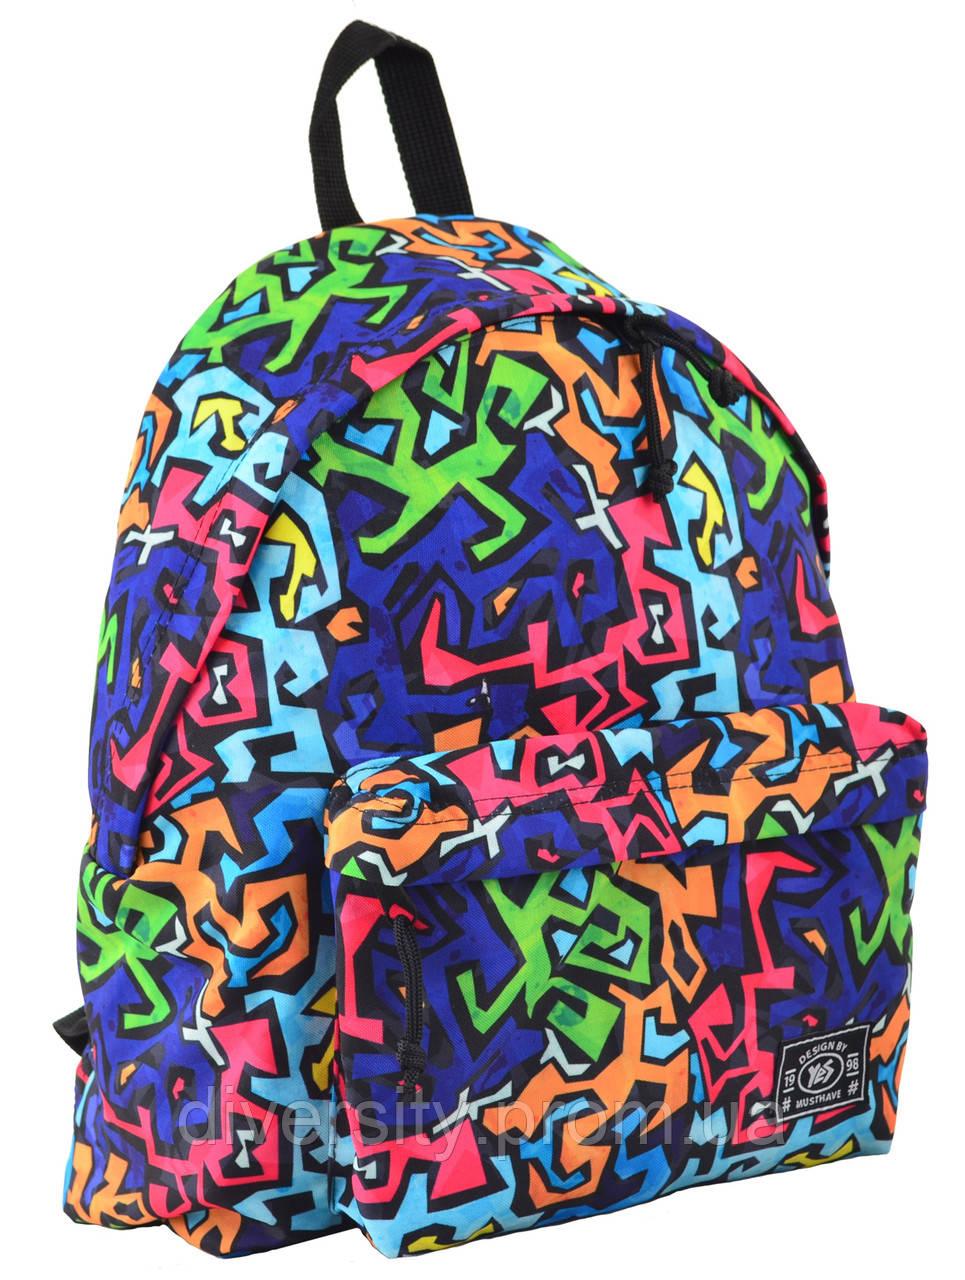 Молодежный рюкзак YES  ST-17 Crazy maze, 42*32*12